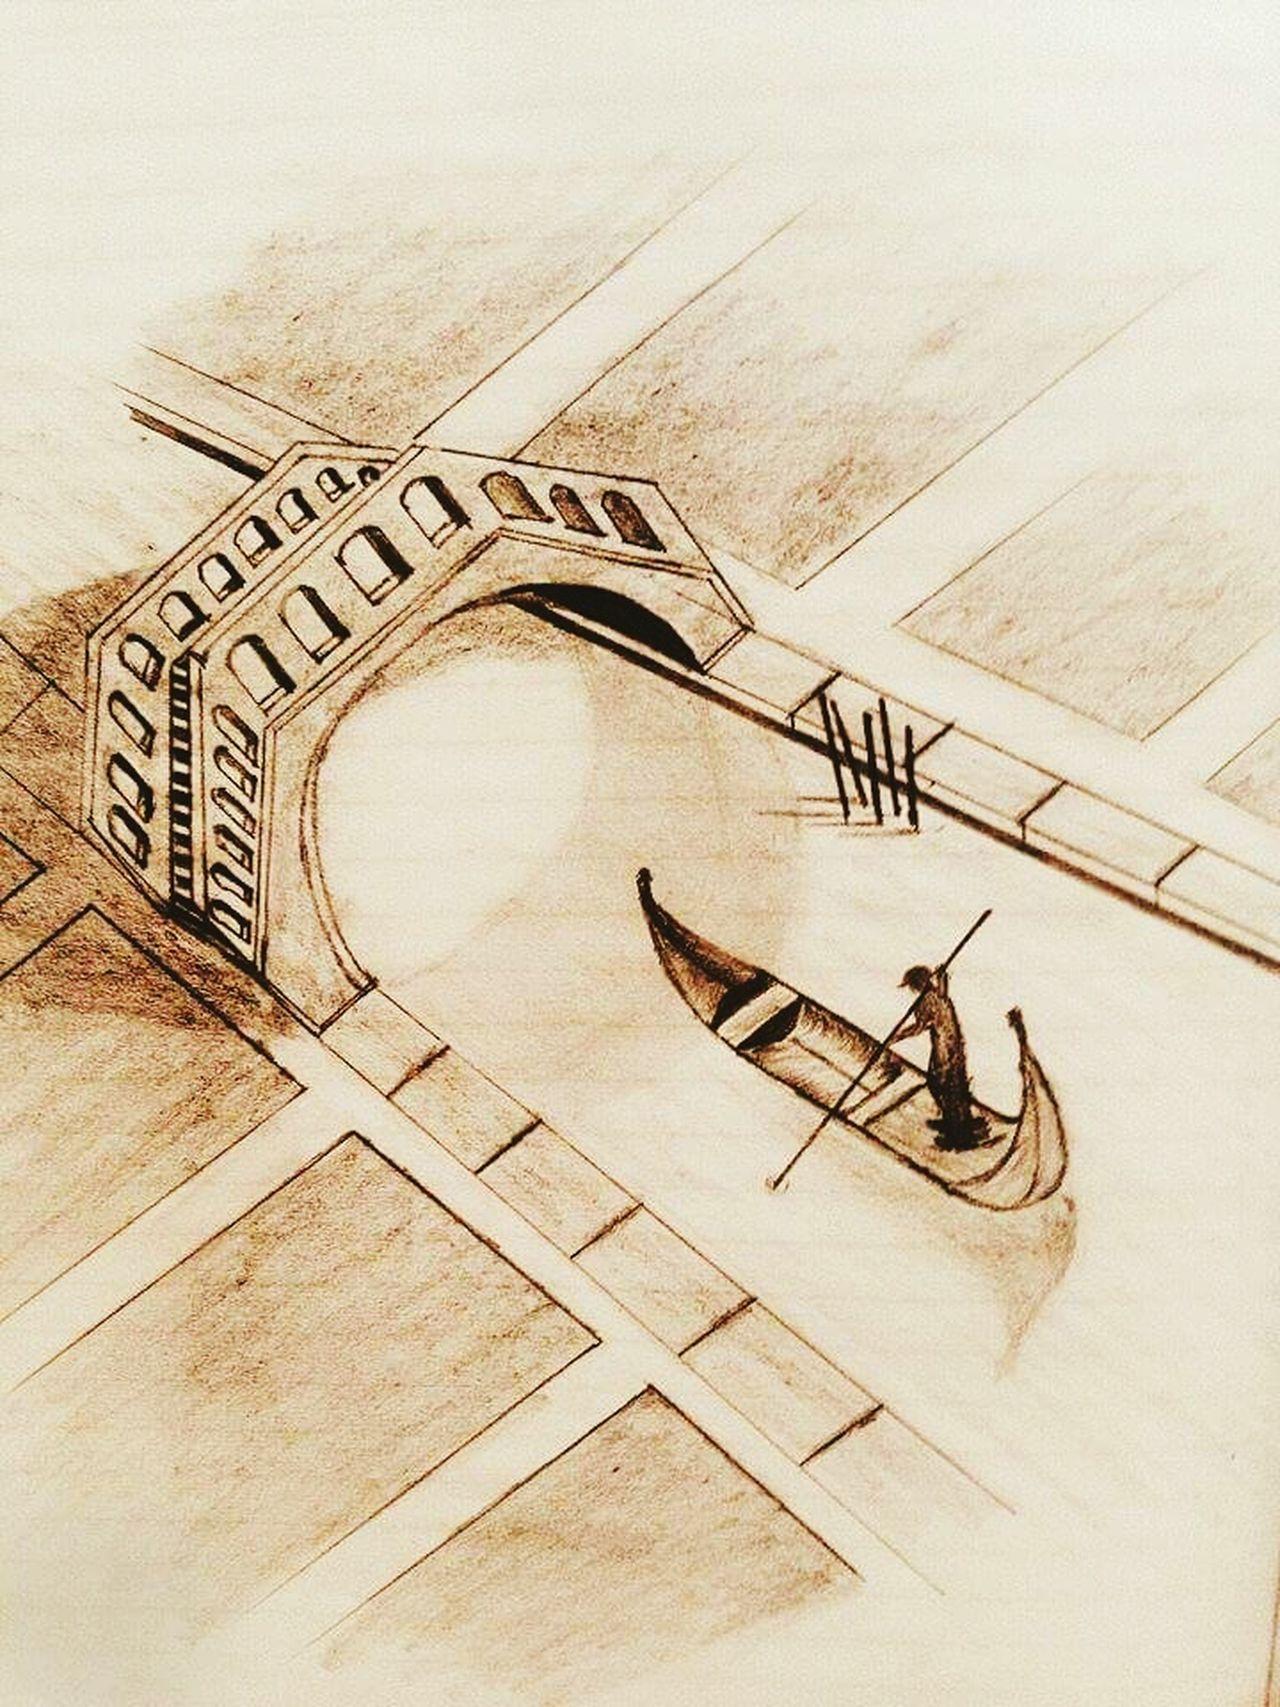 Sketch by my Hands 😚 Captured Tooo 😉 Delhi